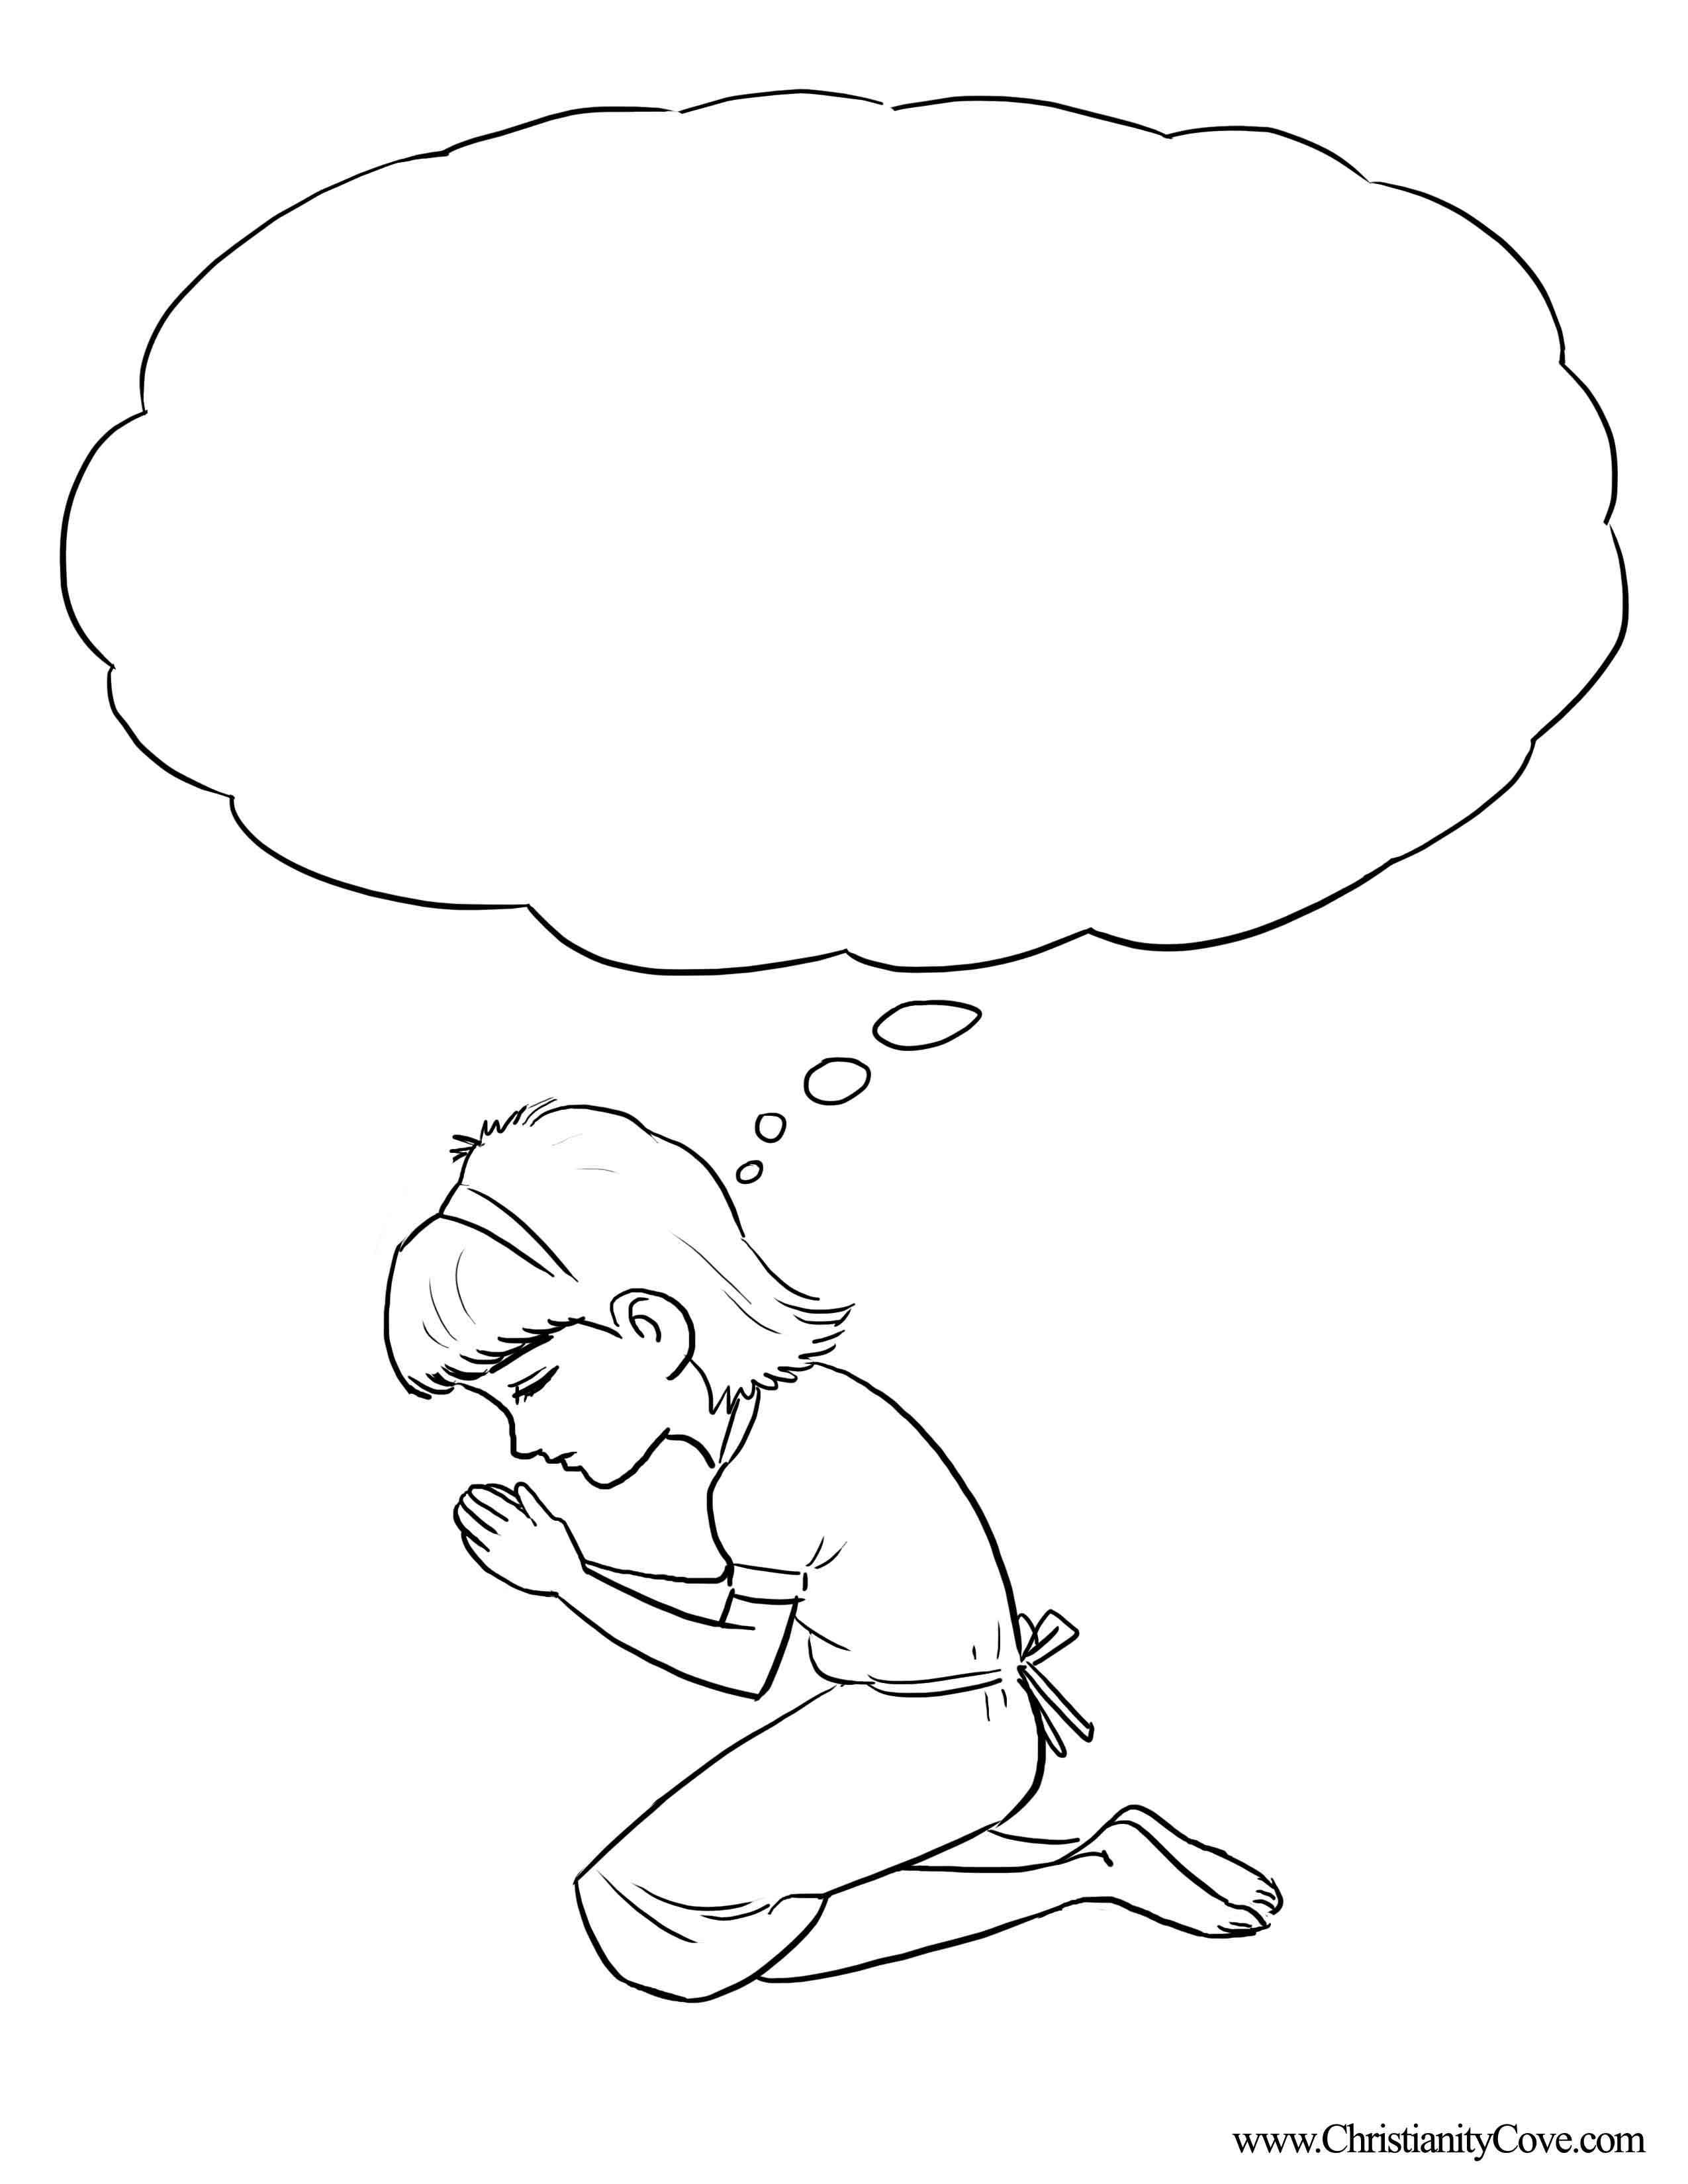 2550x3300 Interesting Child Praying Coloring Page Drawin